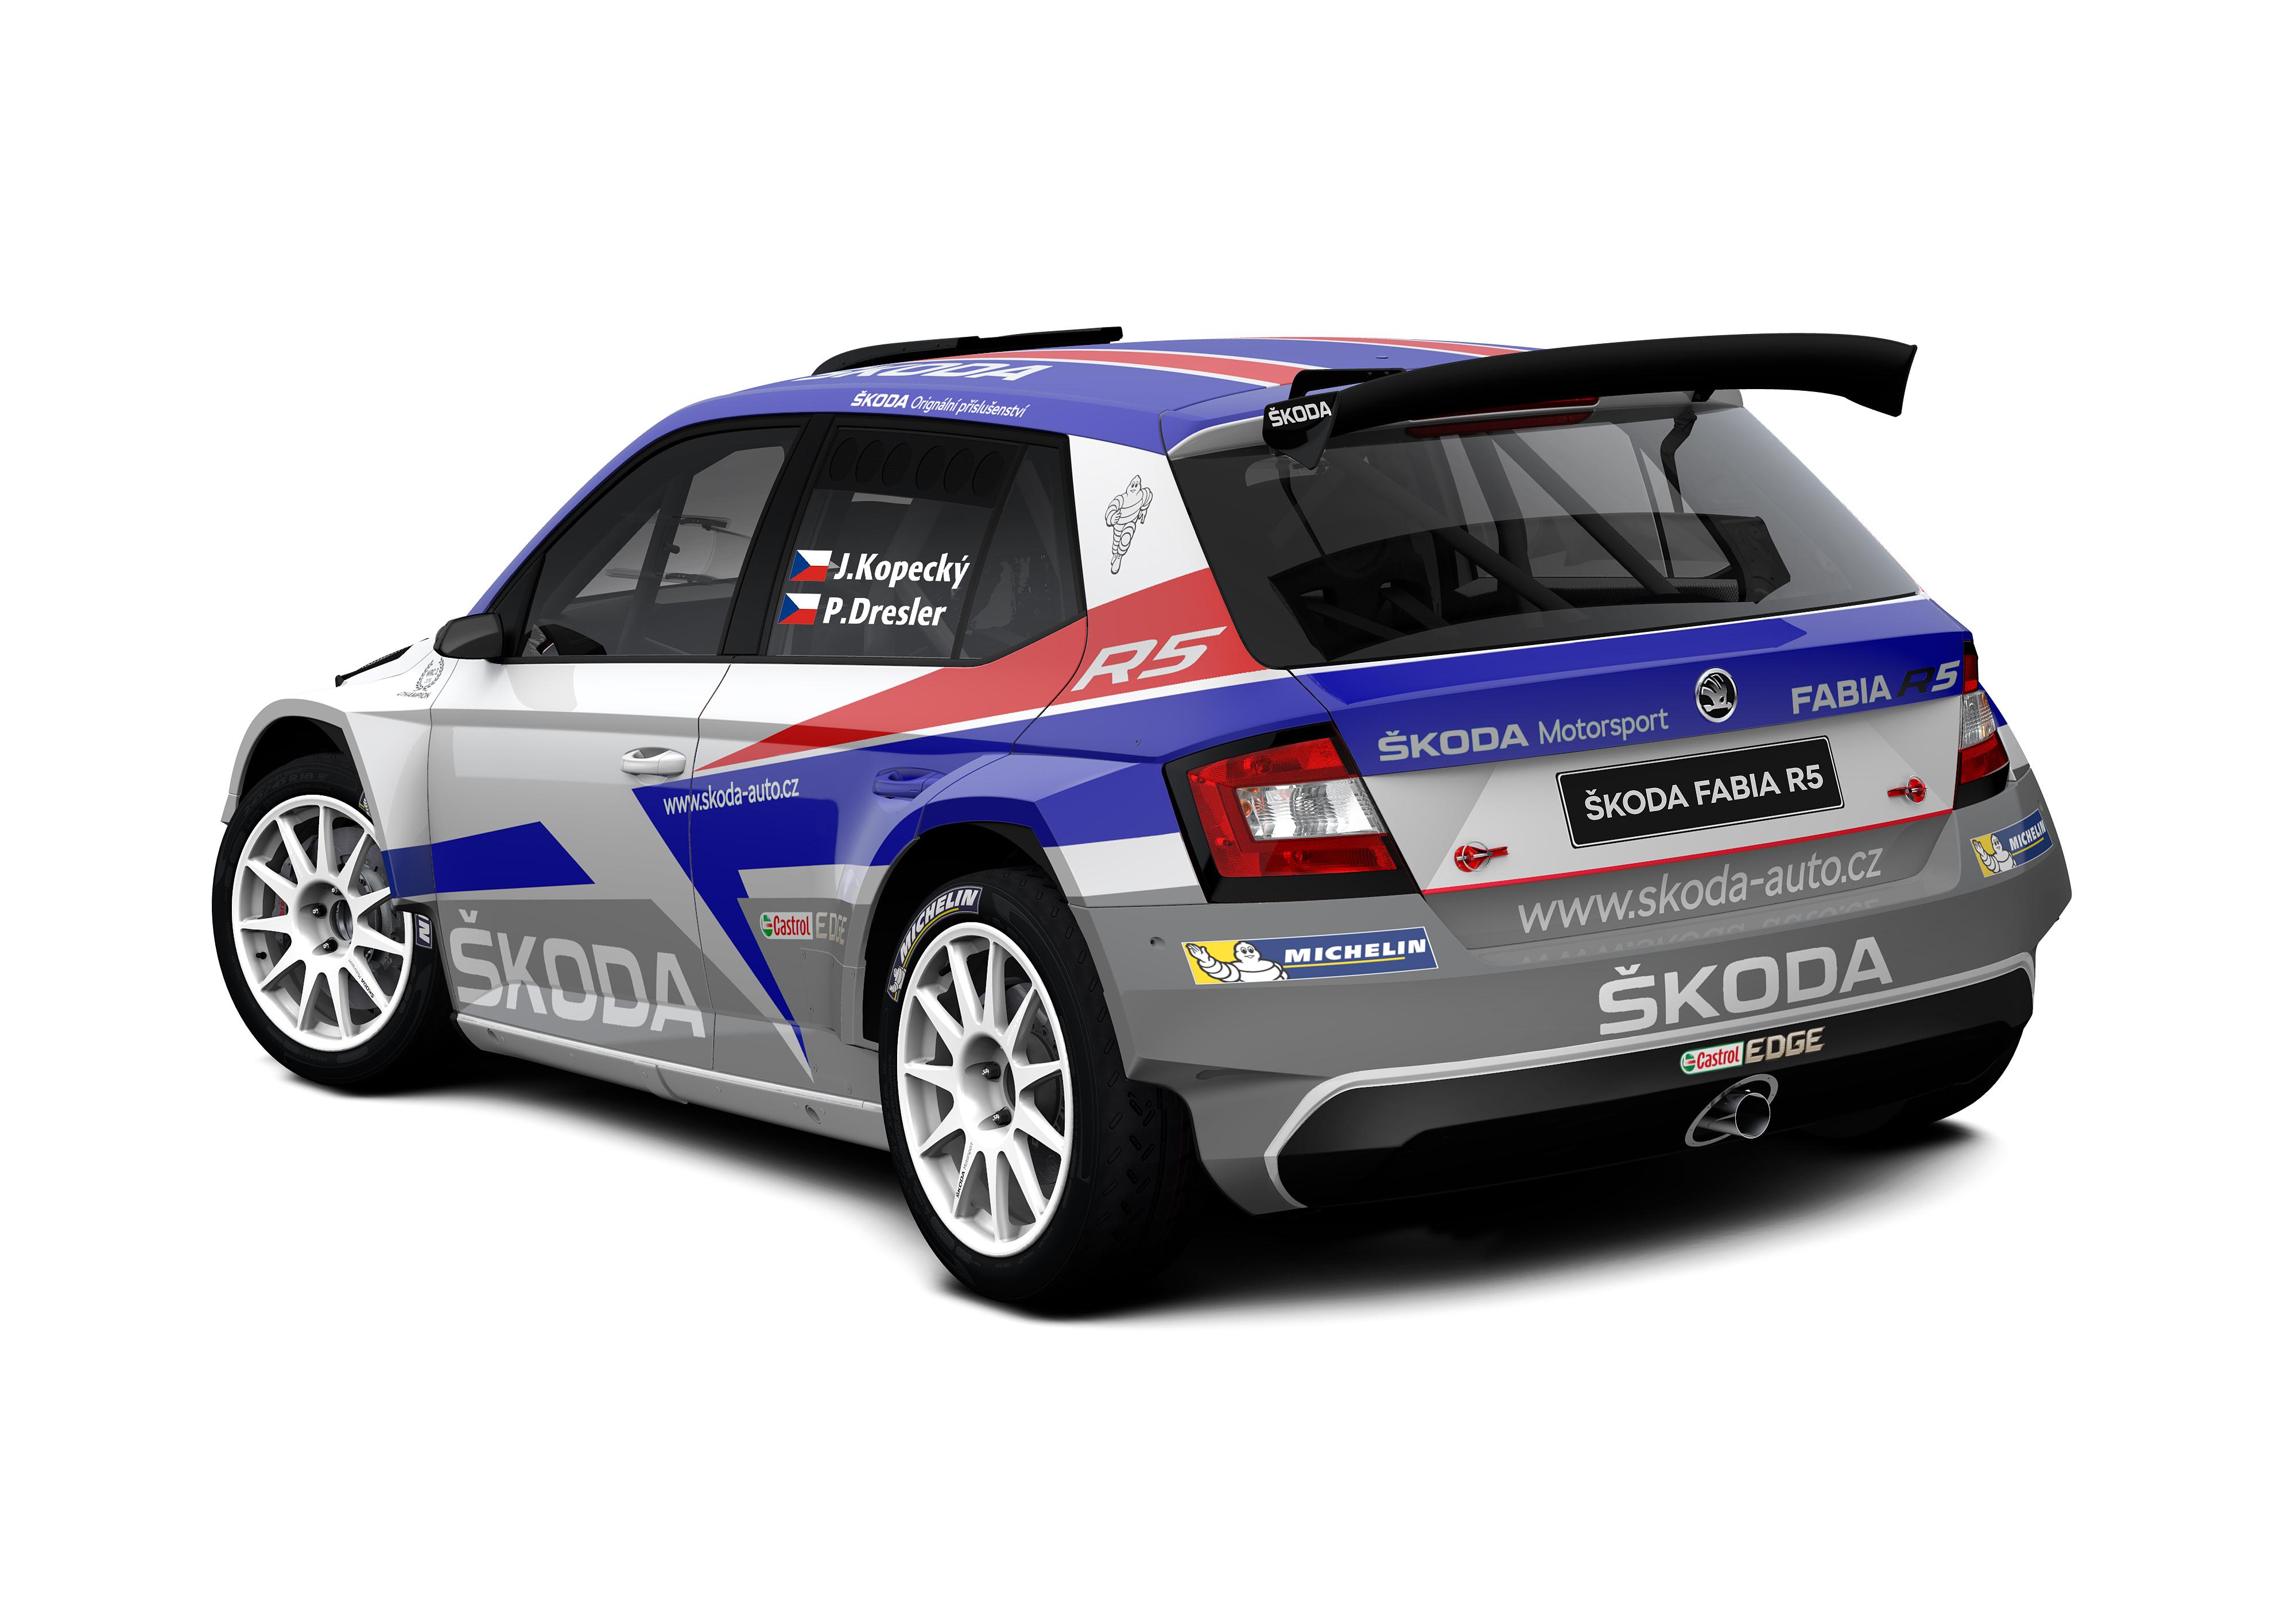 skoda motorsport mit drei teams bei der rallye monte carlo. Black Bedroom Furniture Sets. Home Design Ideas